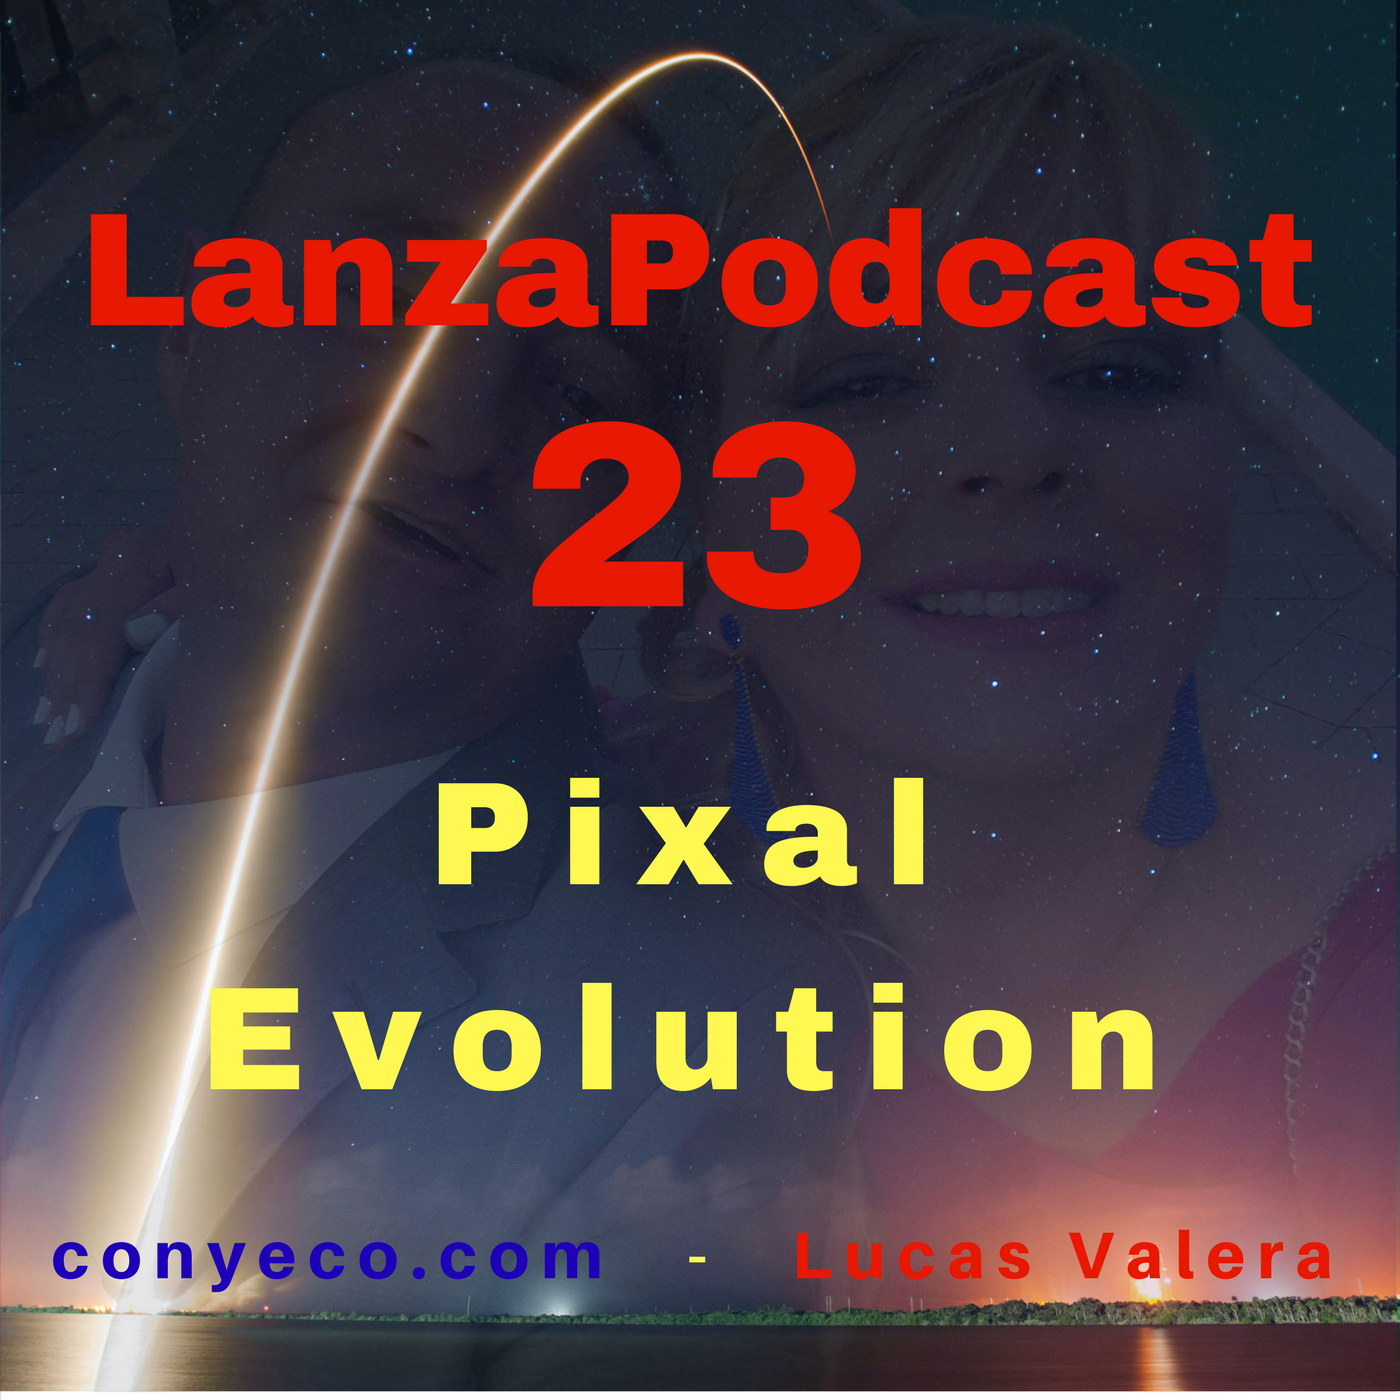 LanzaPodcast-23-Pixal-Evolution-conyeco.com-Lucas-Valera